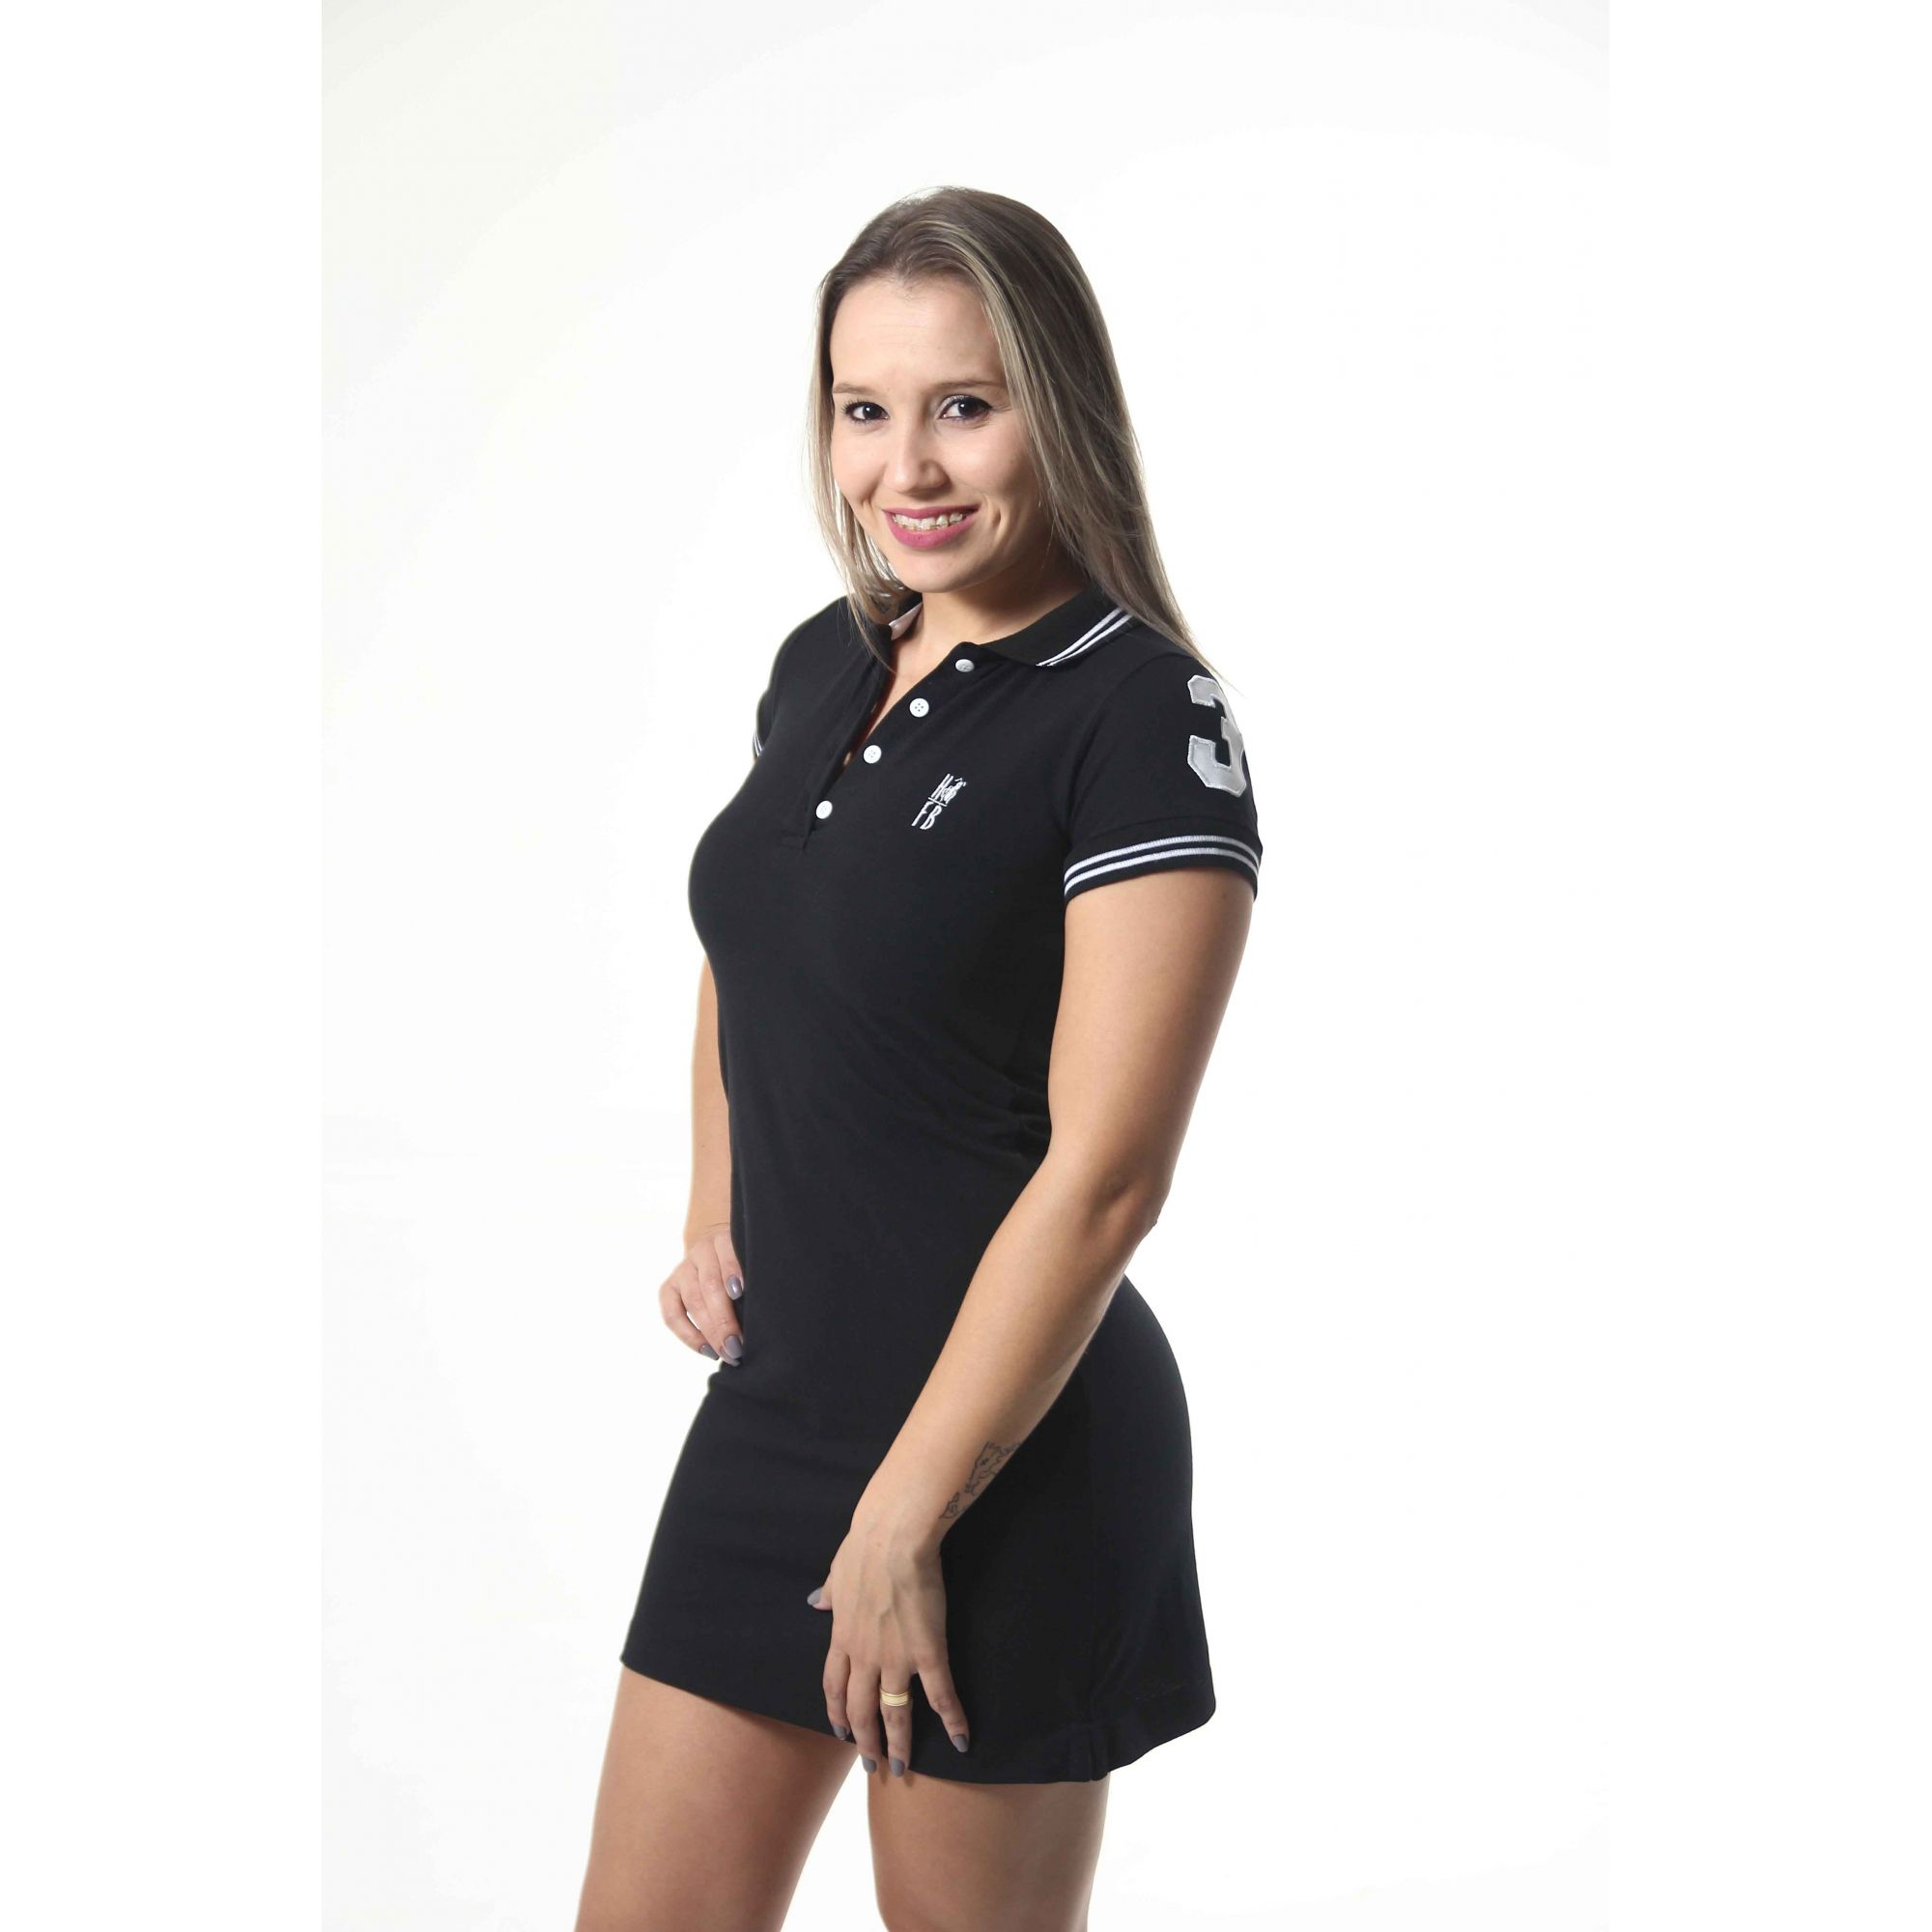 Vestido Polo Preto Elegância  - Heitor Fashion Brazil